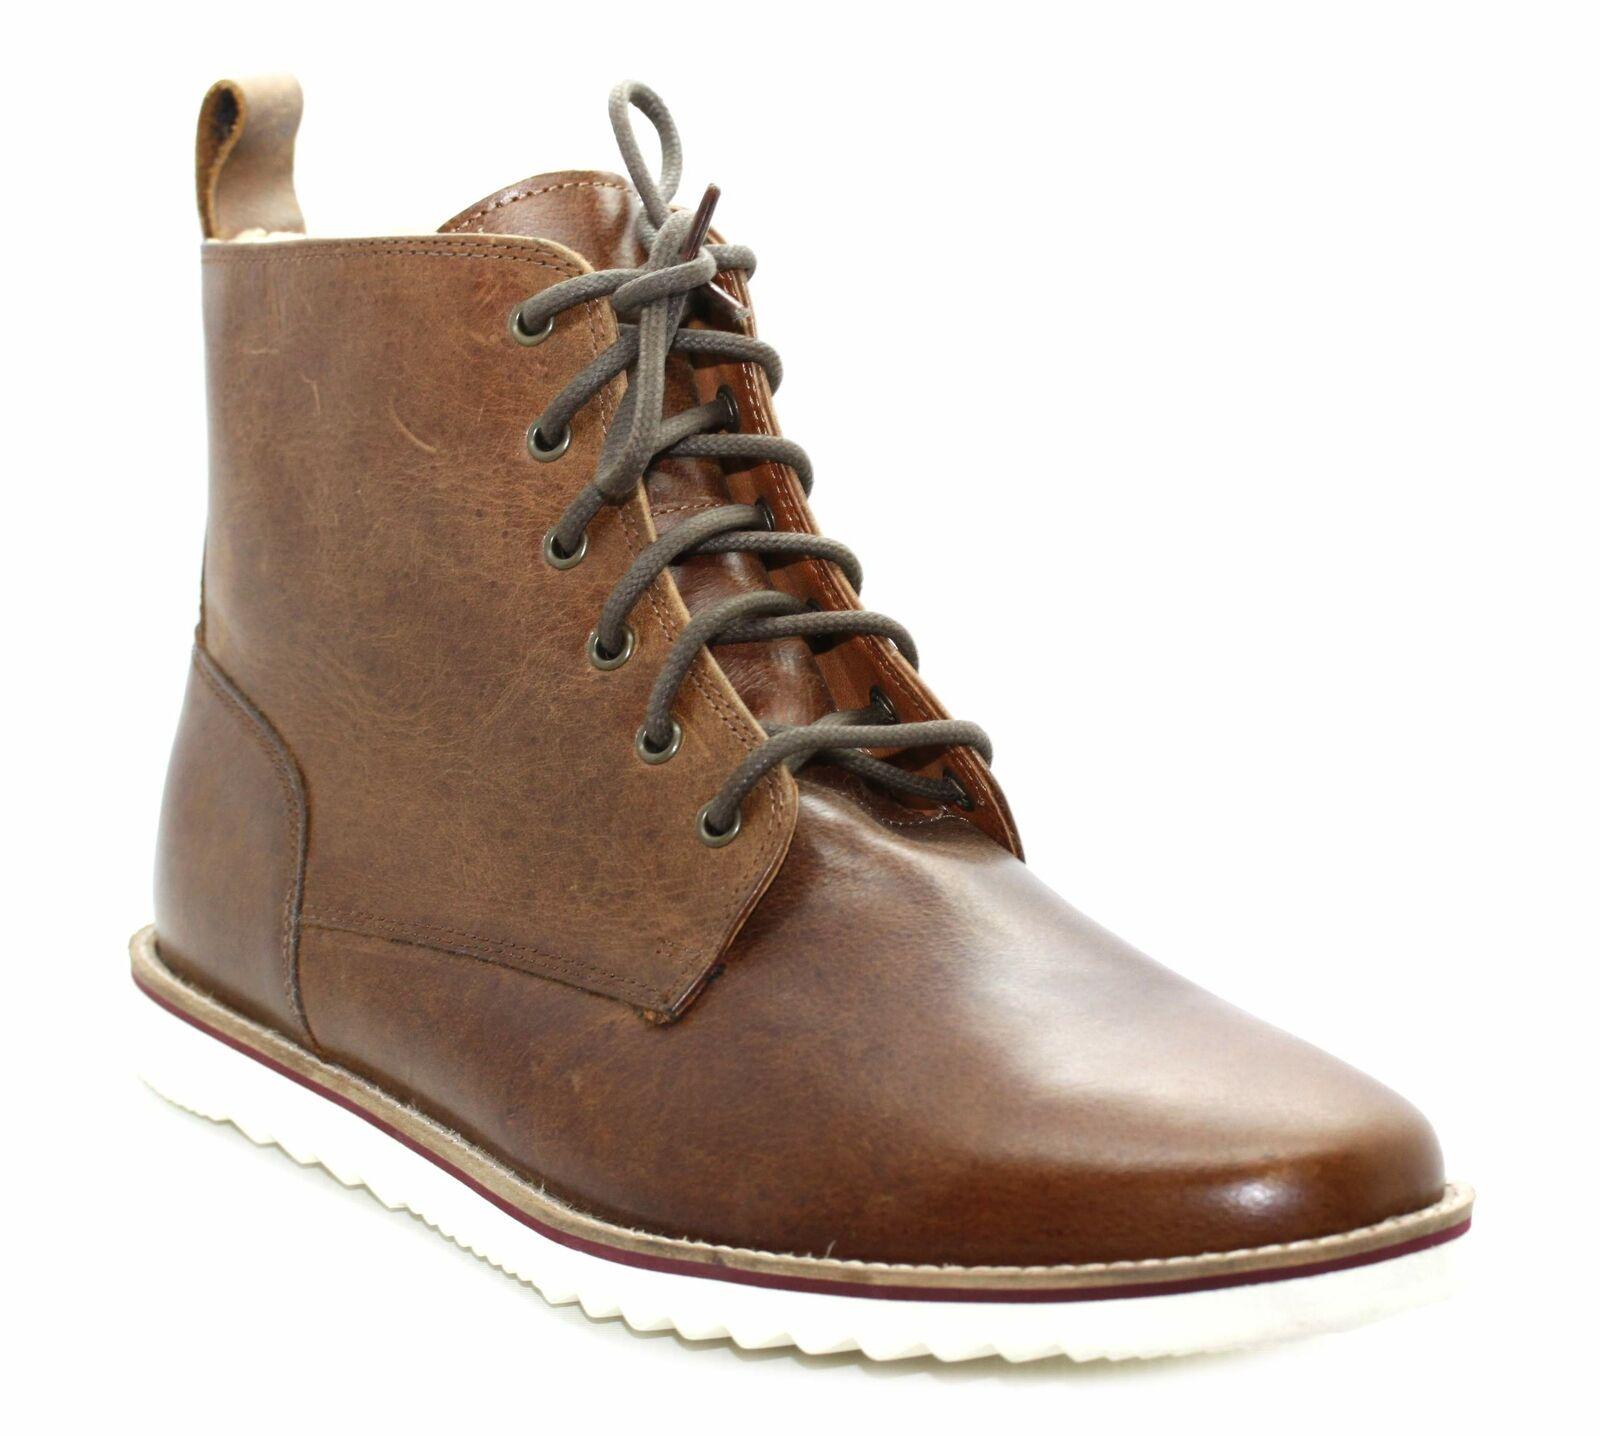 Mens Tan Leather Faux Fur Lined Lace Up Boots Size UK 12 EU 47